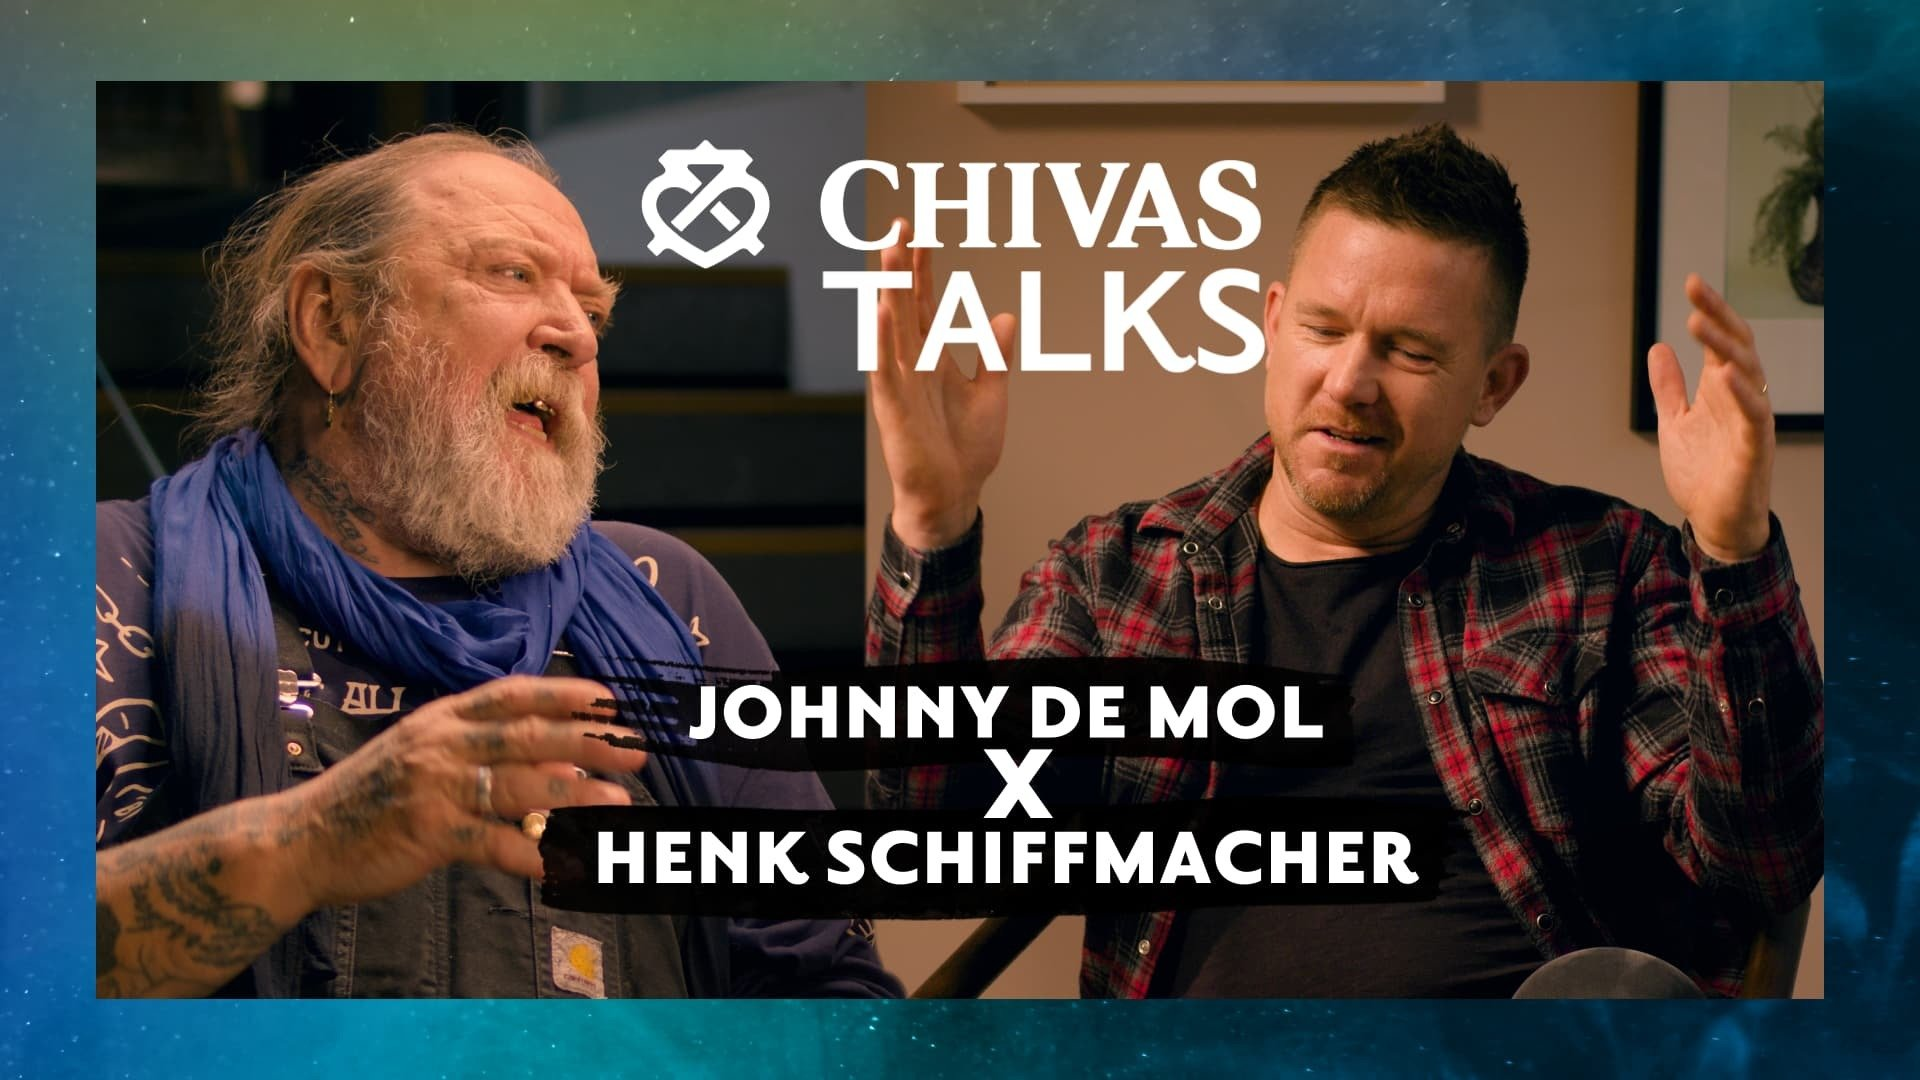 Henk Schiffmacher x Johnny de Mol - Chivas Talks